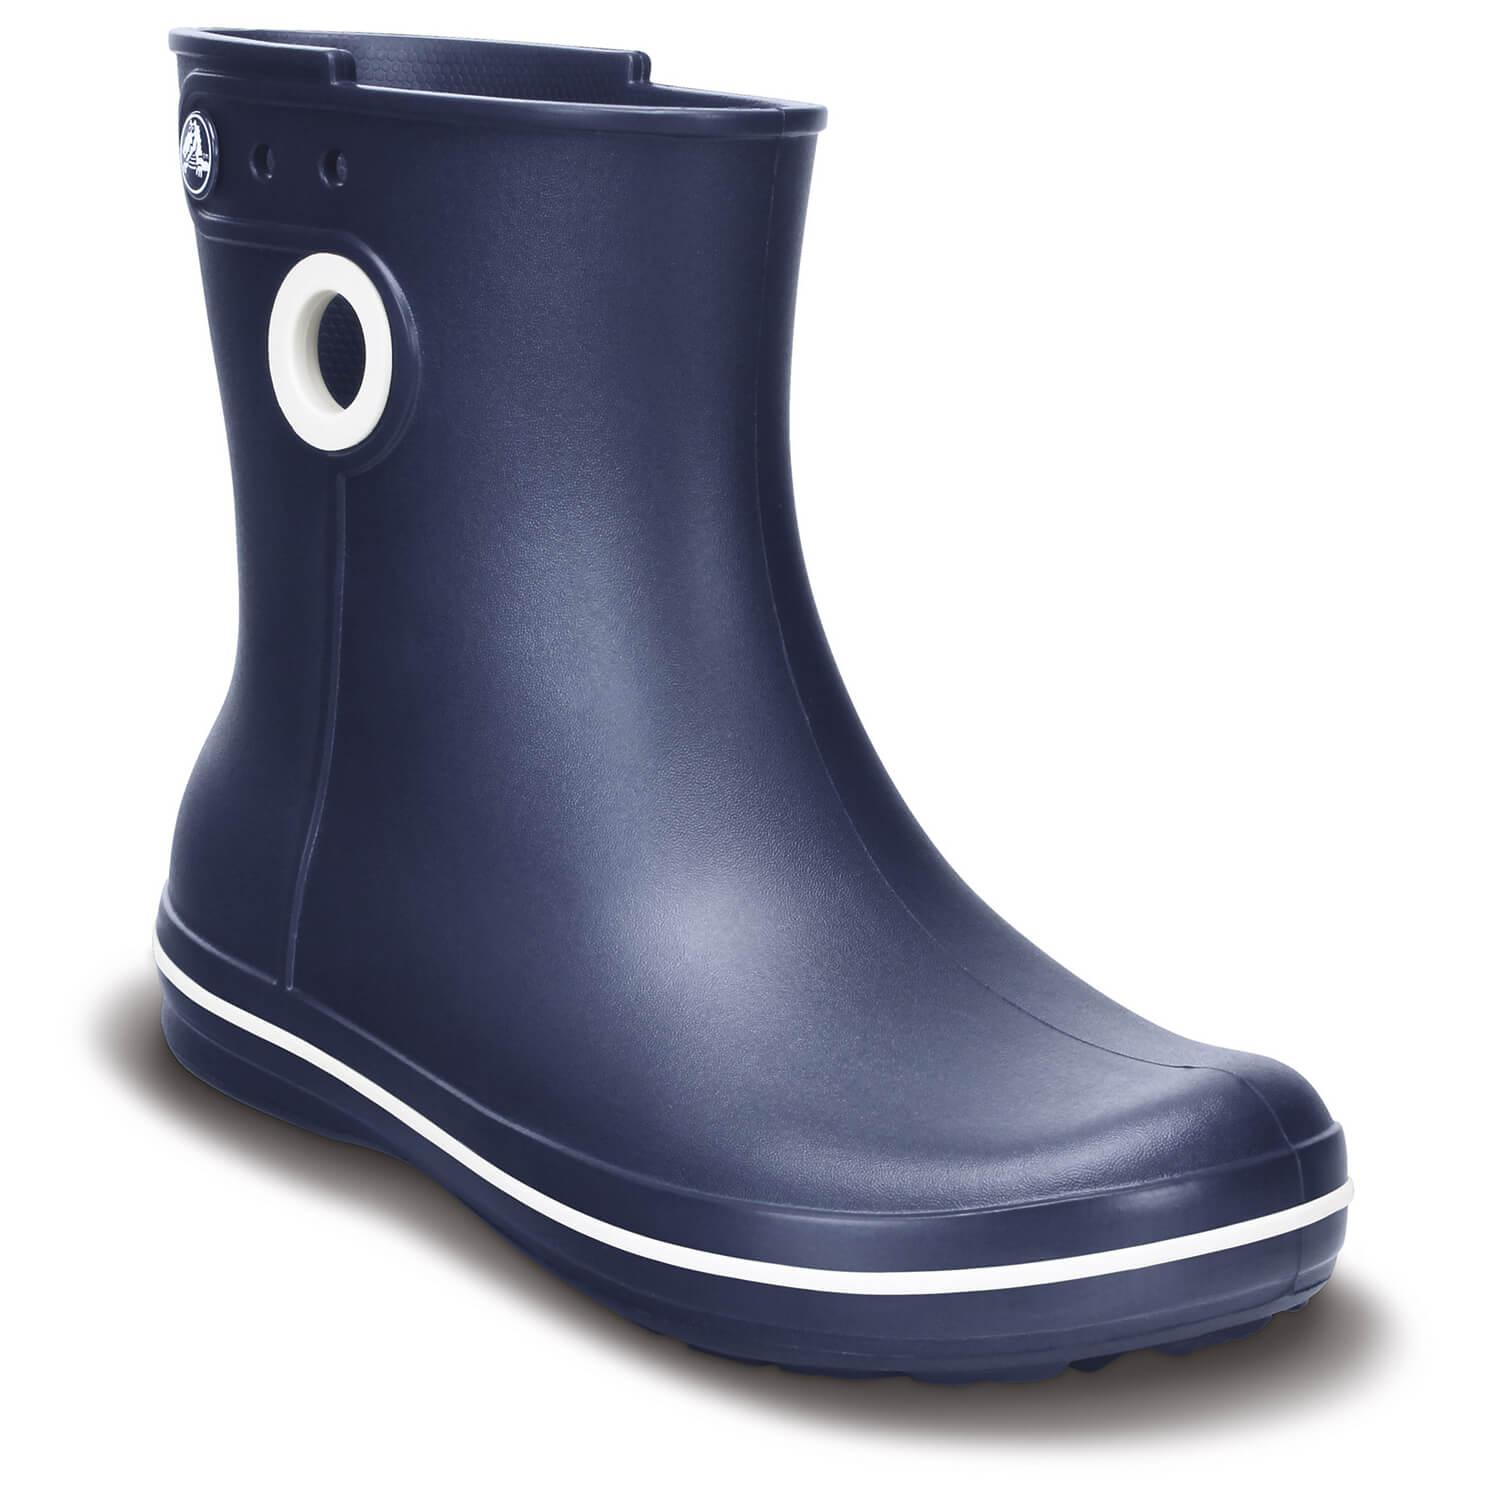 65fdf447f0c8 ... Crocs - Women s Jaunt Shorty Boot - Wellington boots ...